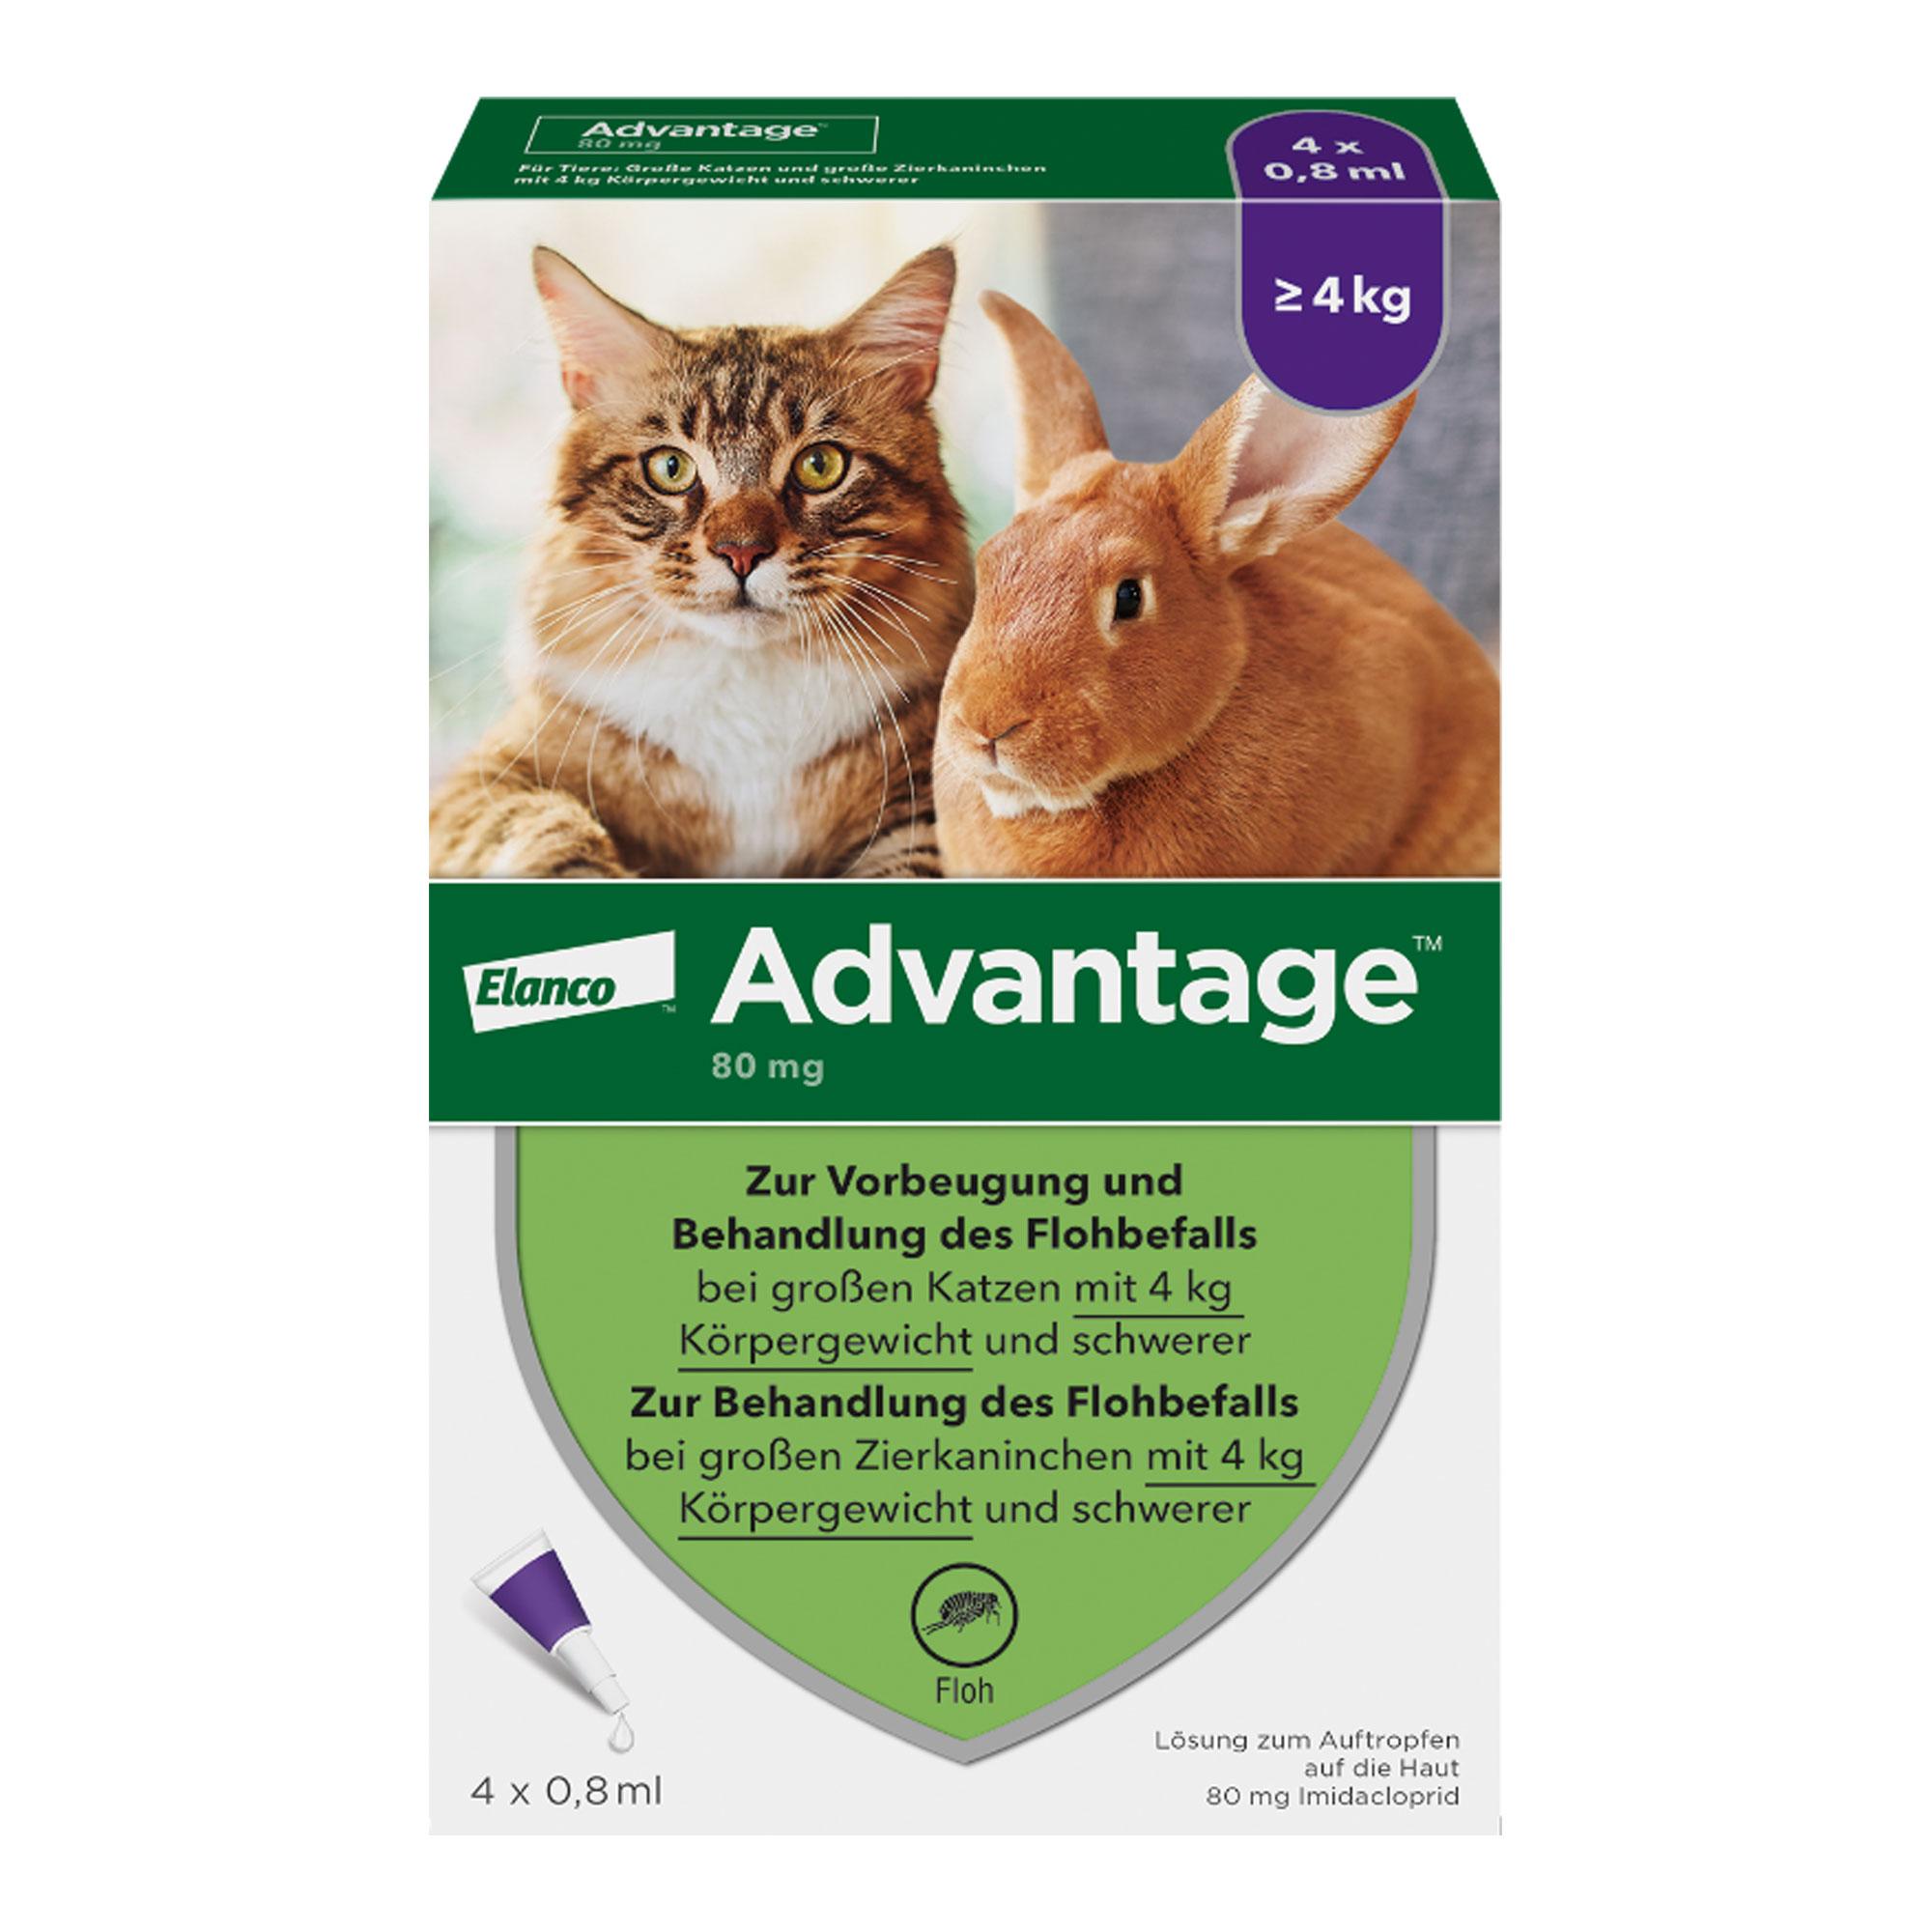 Advantage 80 mg Katze + Zierkaninchen